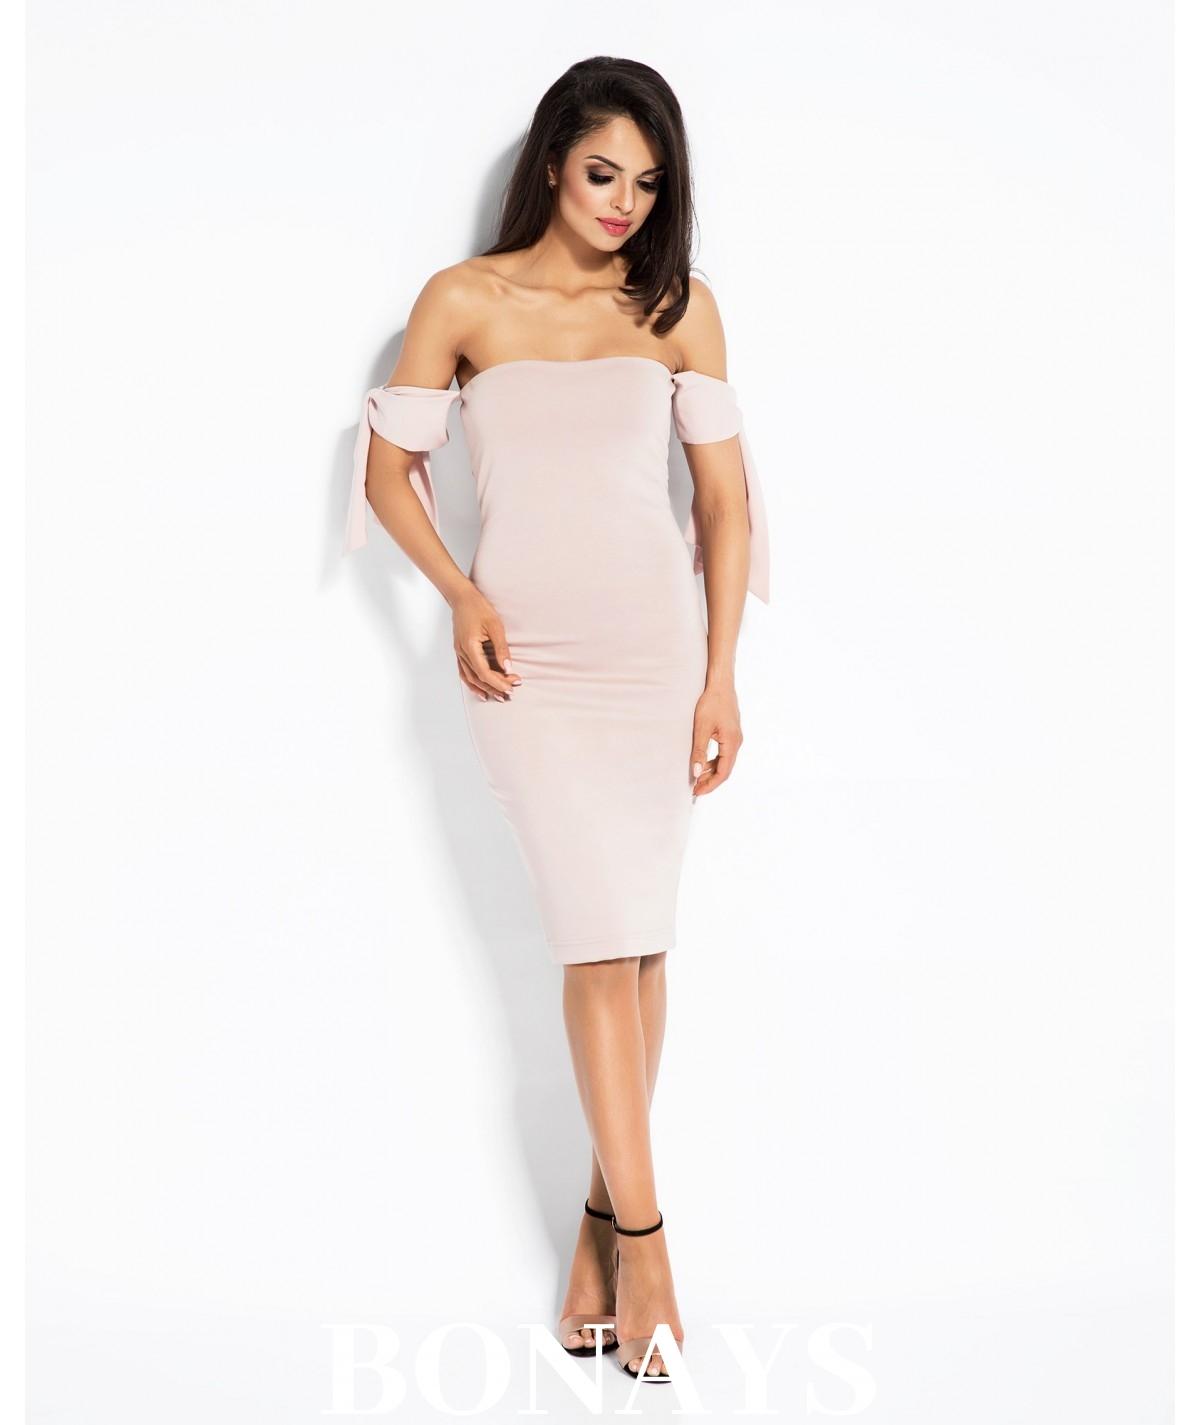 rózowa dopasowana sukienka bez ramion adel dursi